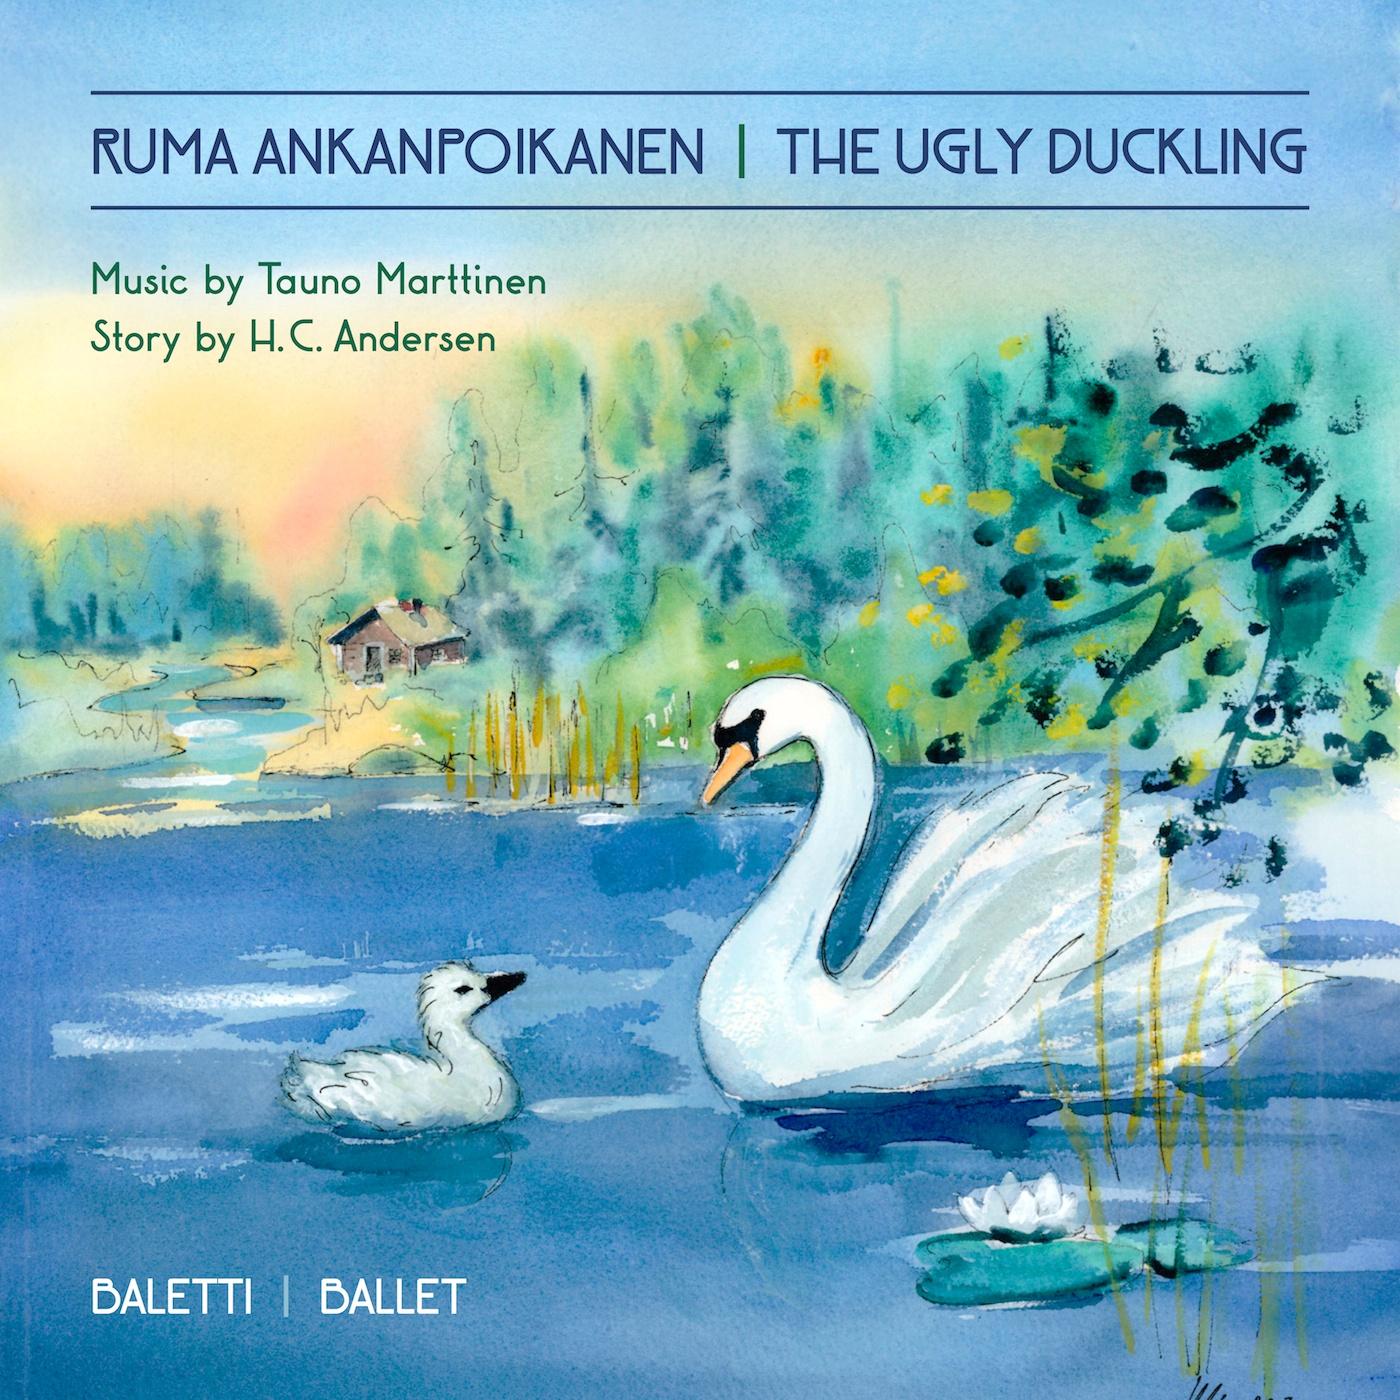 Tauno Marttinen: Ruma Ankanpoikanen - The Ugly Duckling Ballet Music